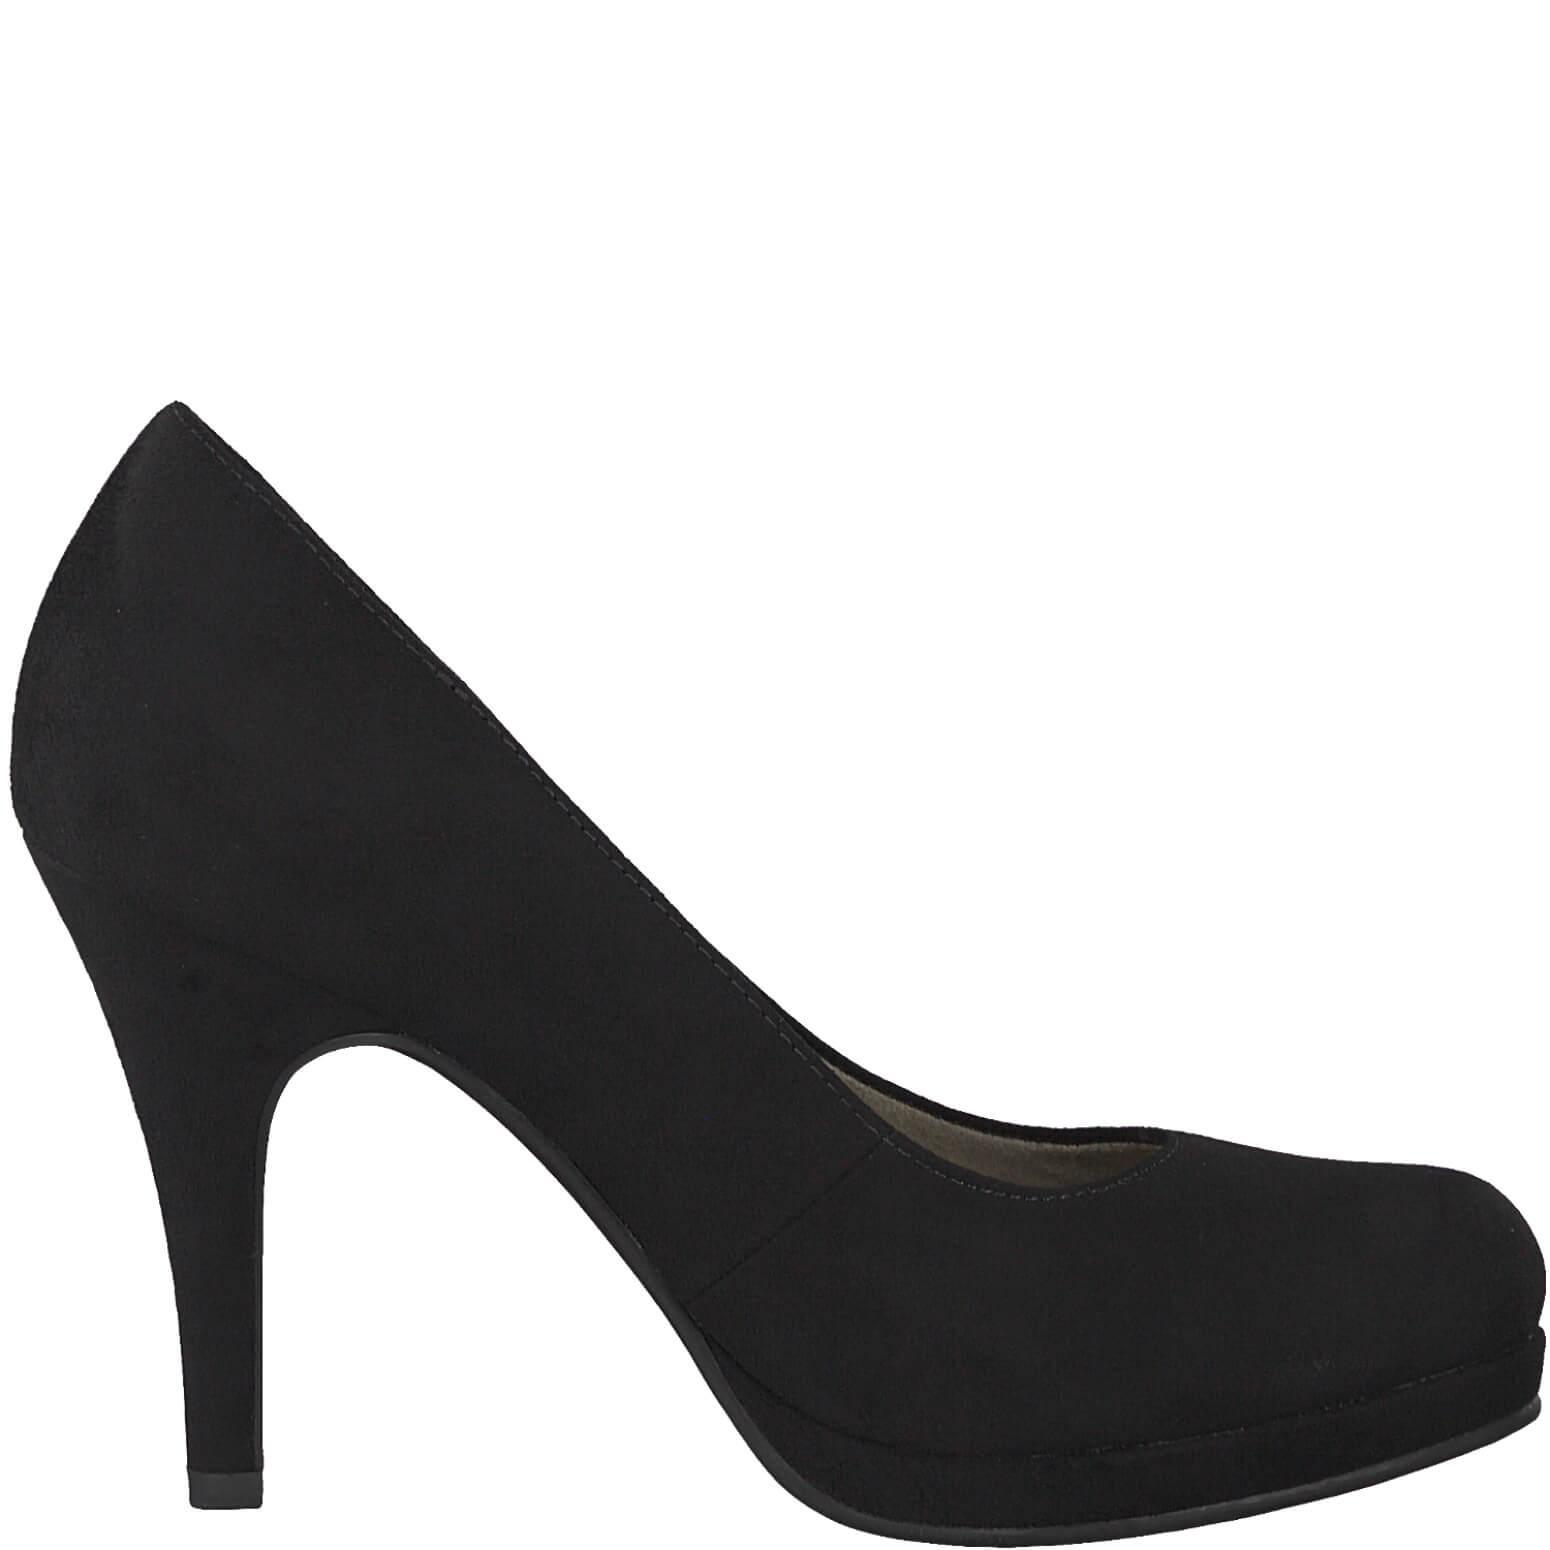 Tamaris Női magassarkú cipő 1-1-24427-31-004 Black kaméle  a2d02197f7